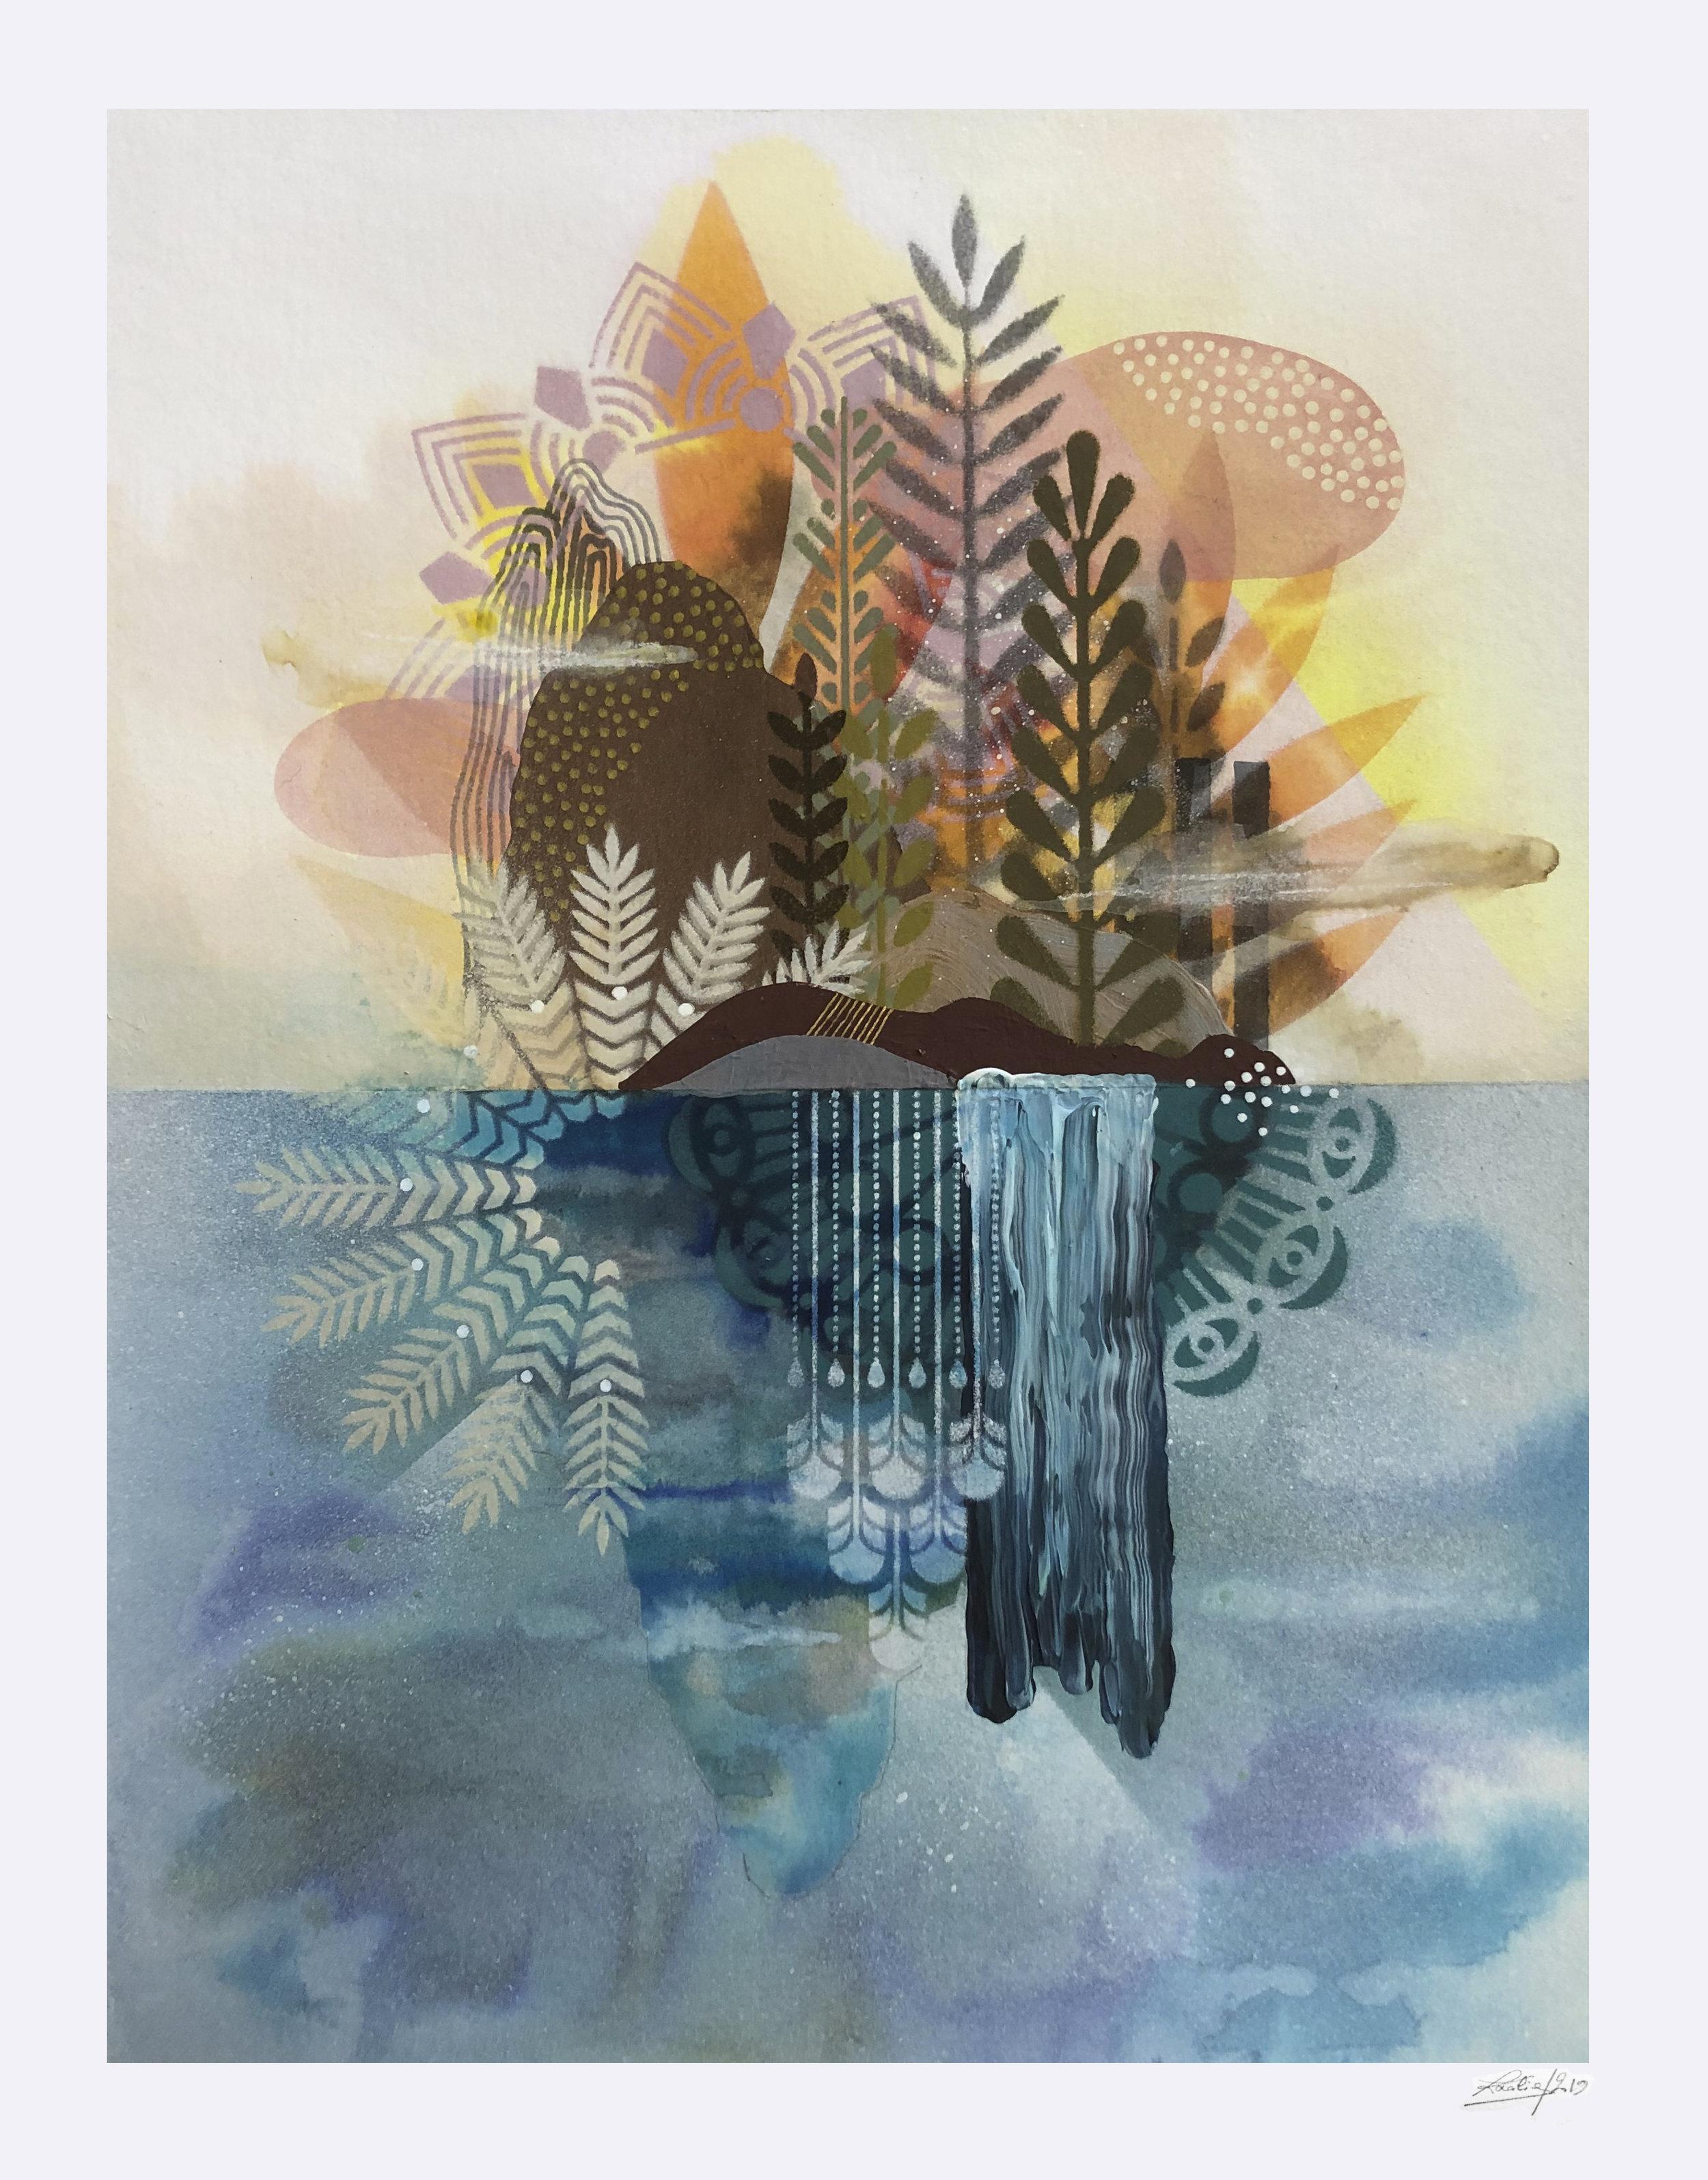 ardin Flottant #4  - Mix media on paper - 36 x46 cm | 2019